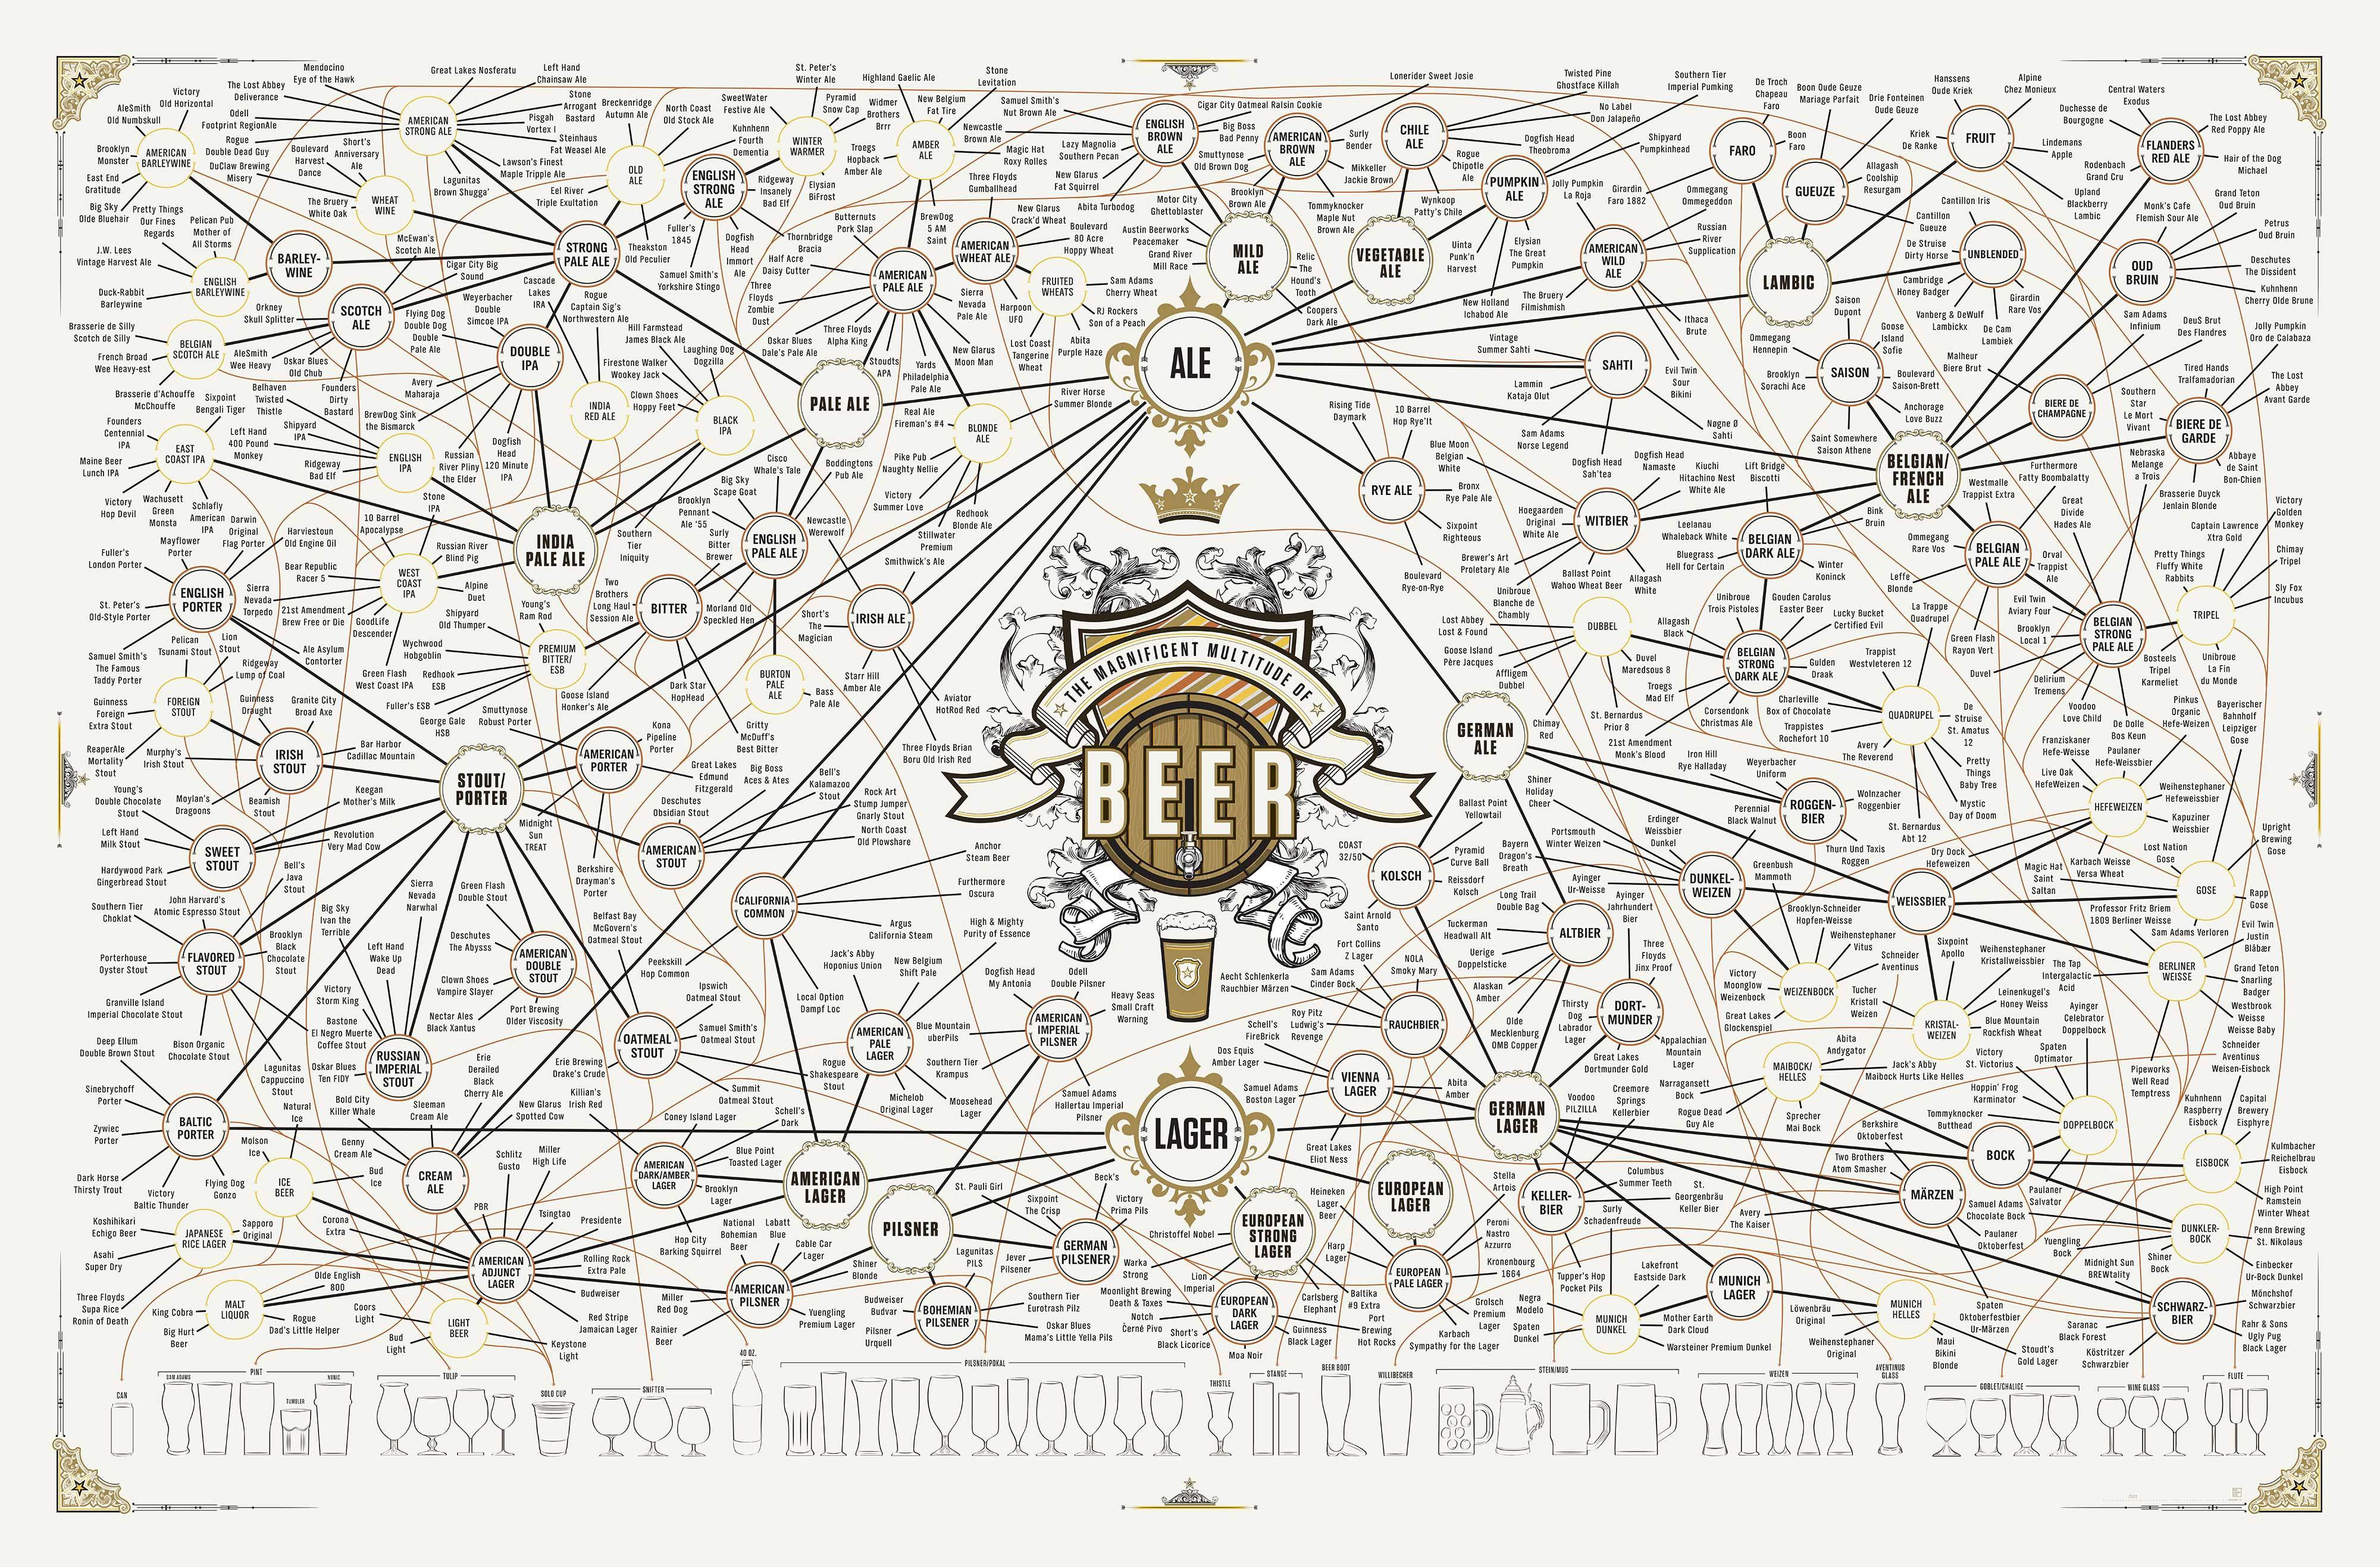 beermap popchat full